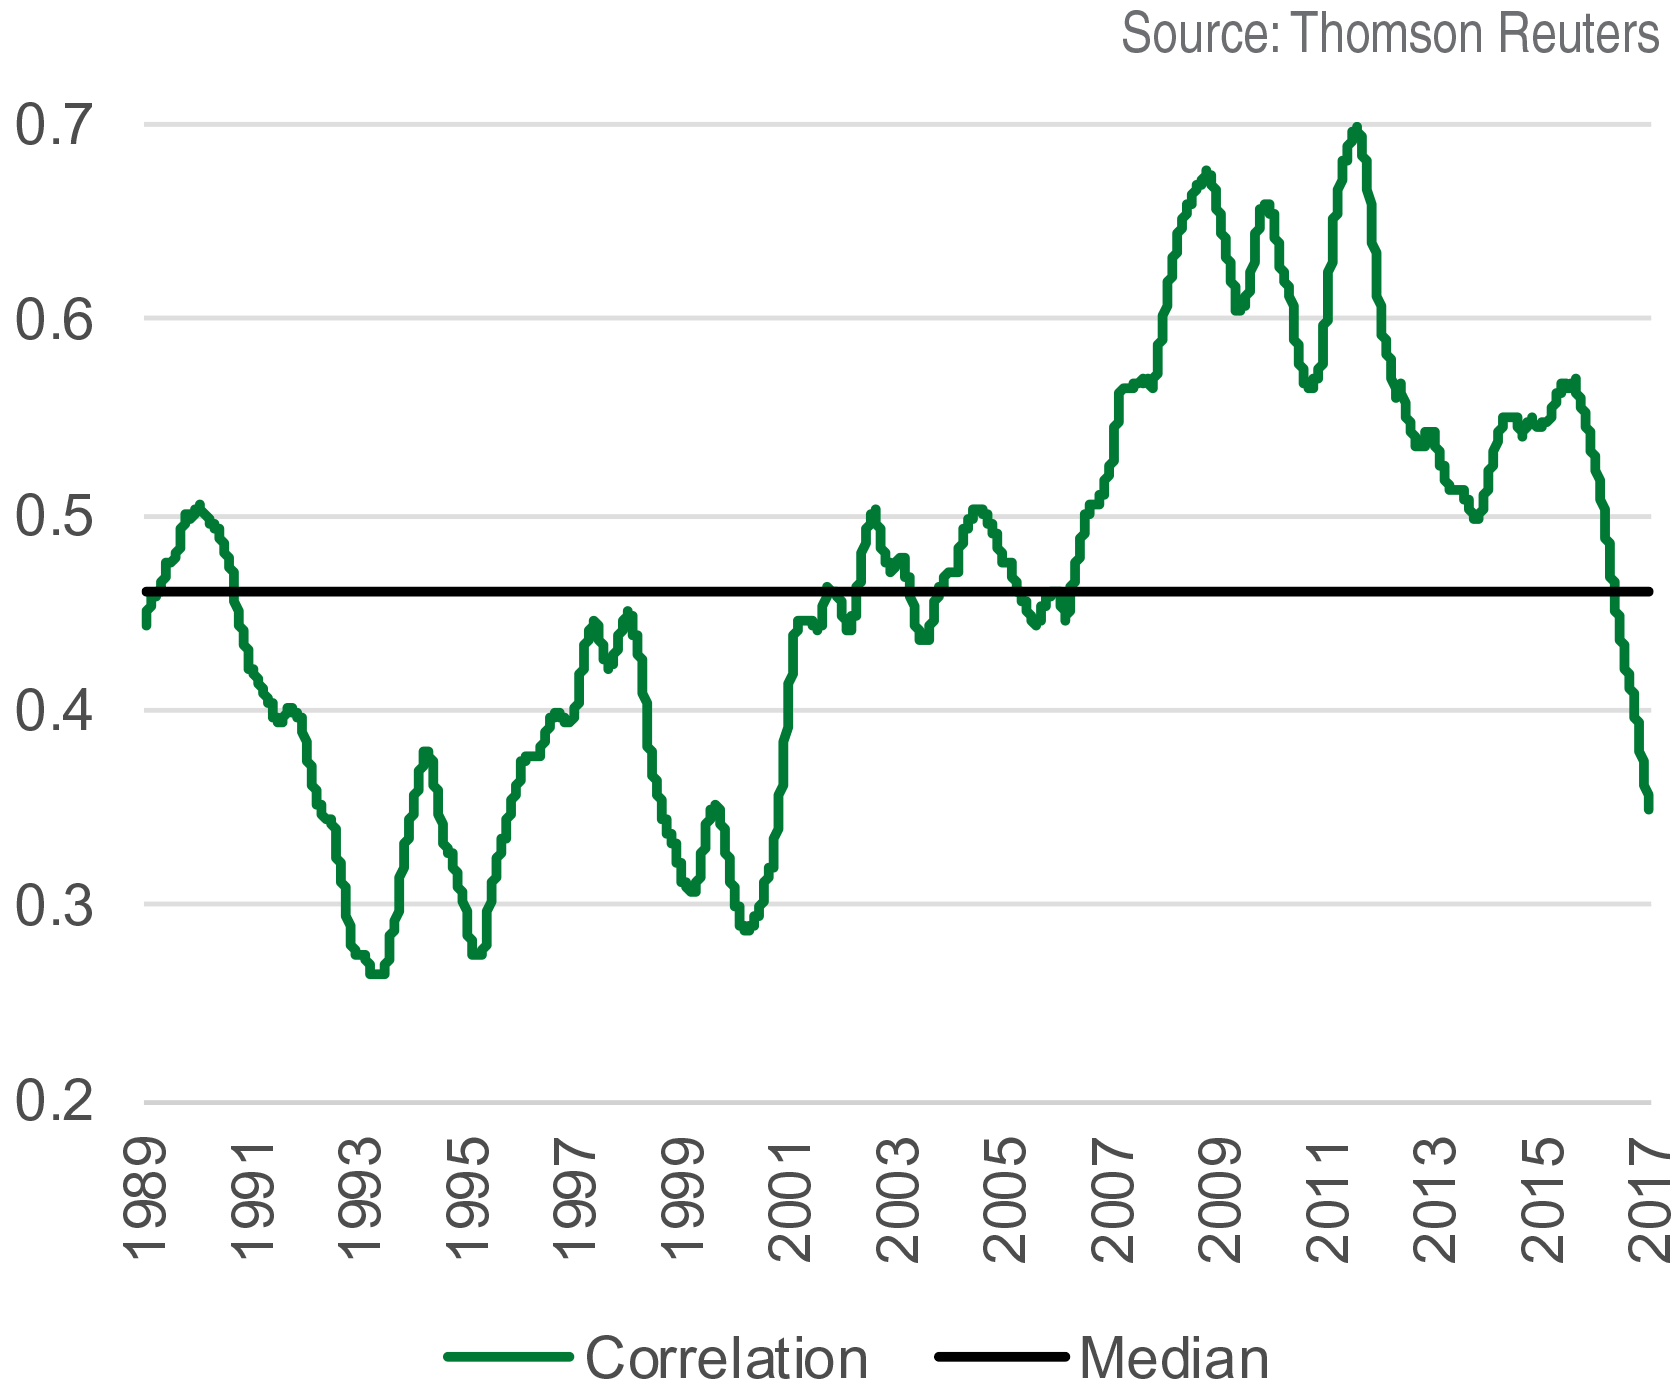 Correlation of S&P 500 Constituents vs. S&P 500 Index, 12-Month Moving Average